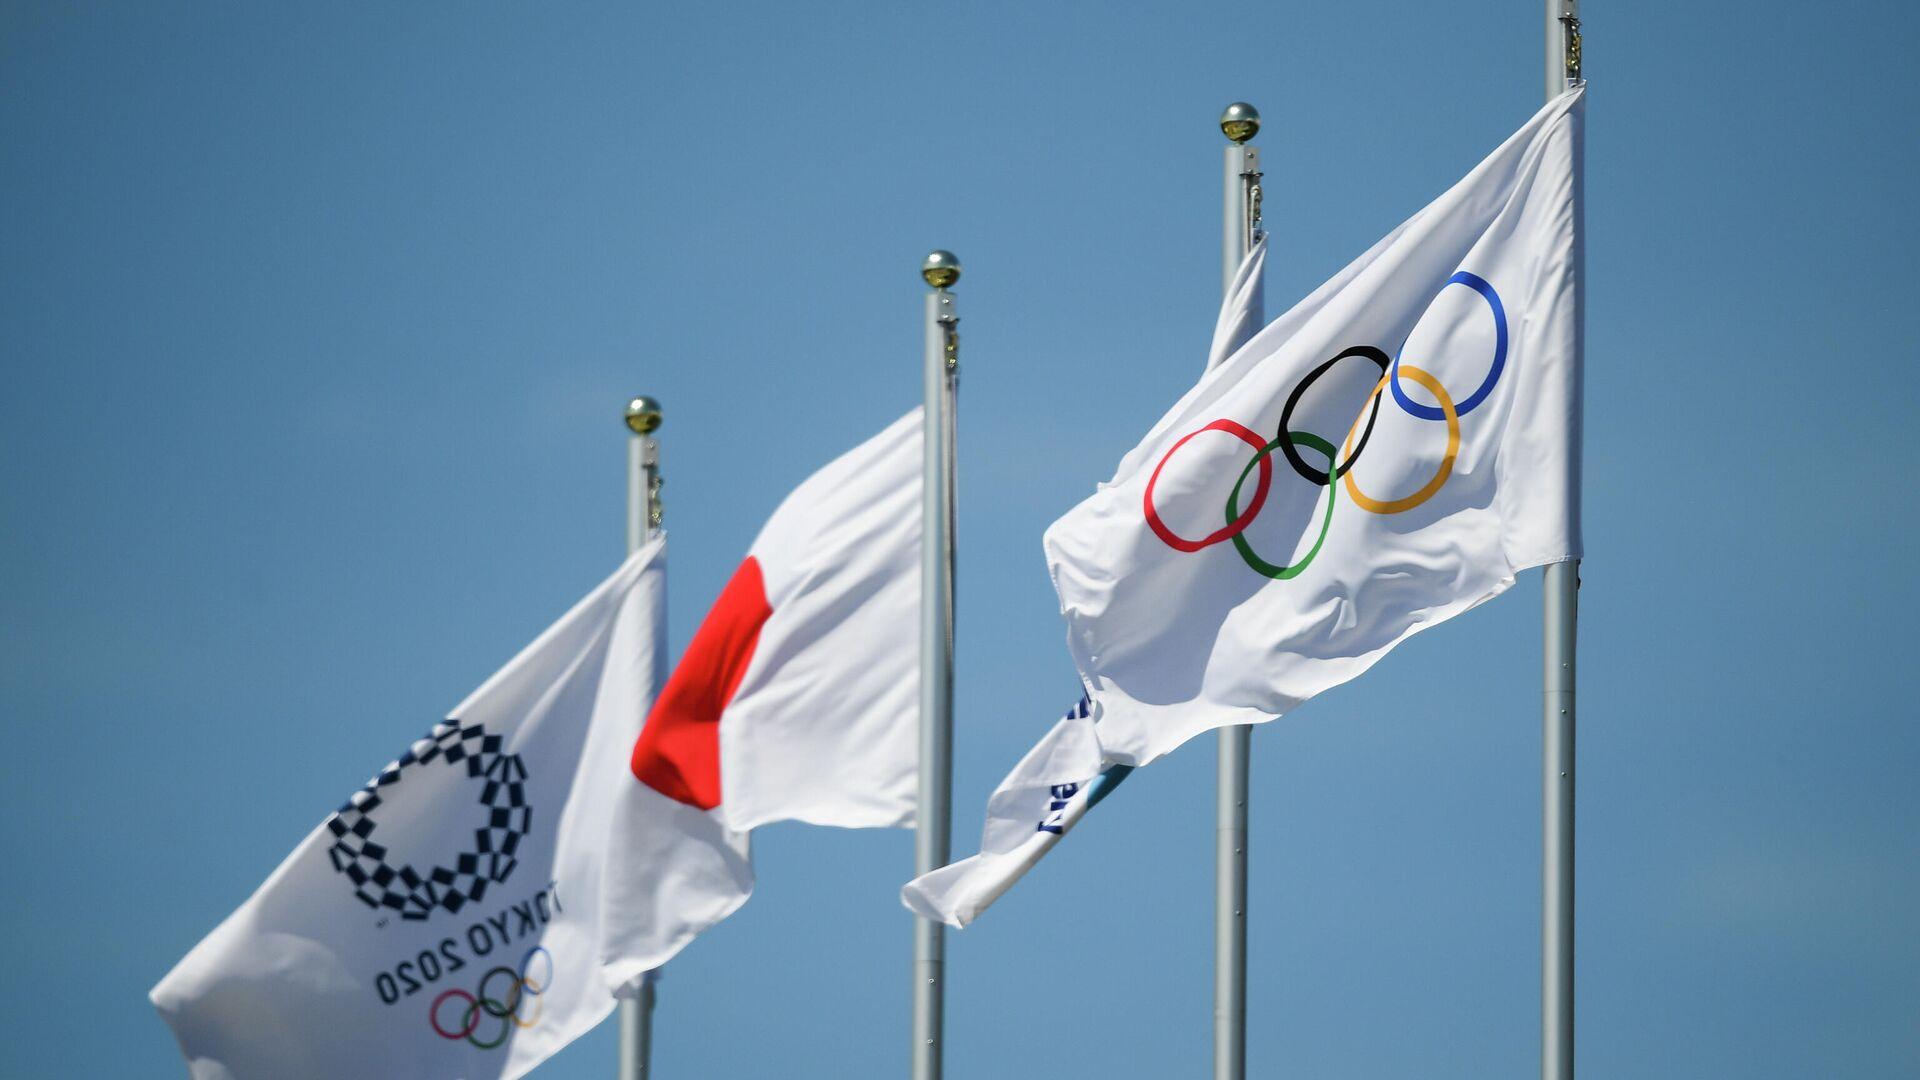 Токио накануне открытия Олимпийских игр - РИА Новости, 1920, 02.08.2021